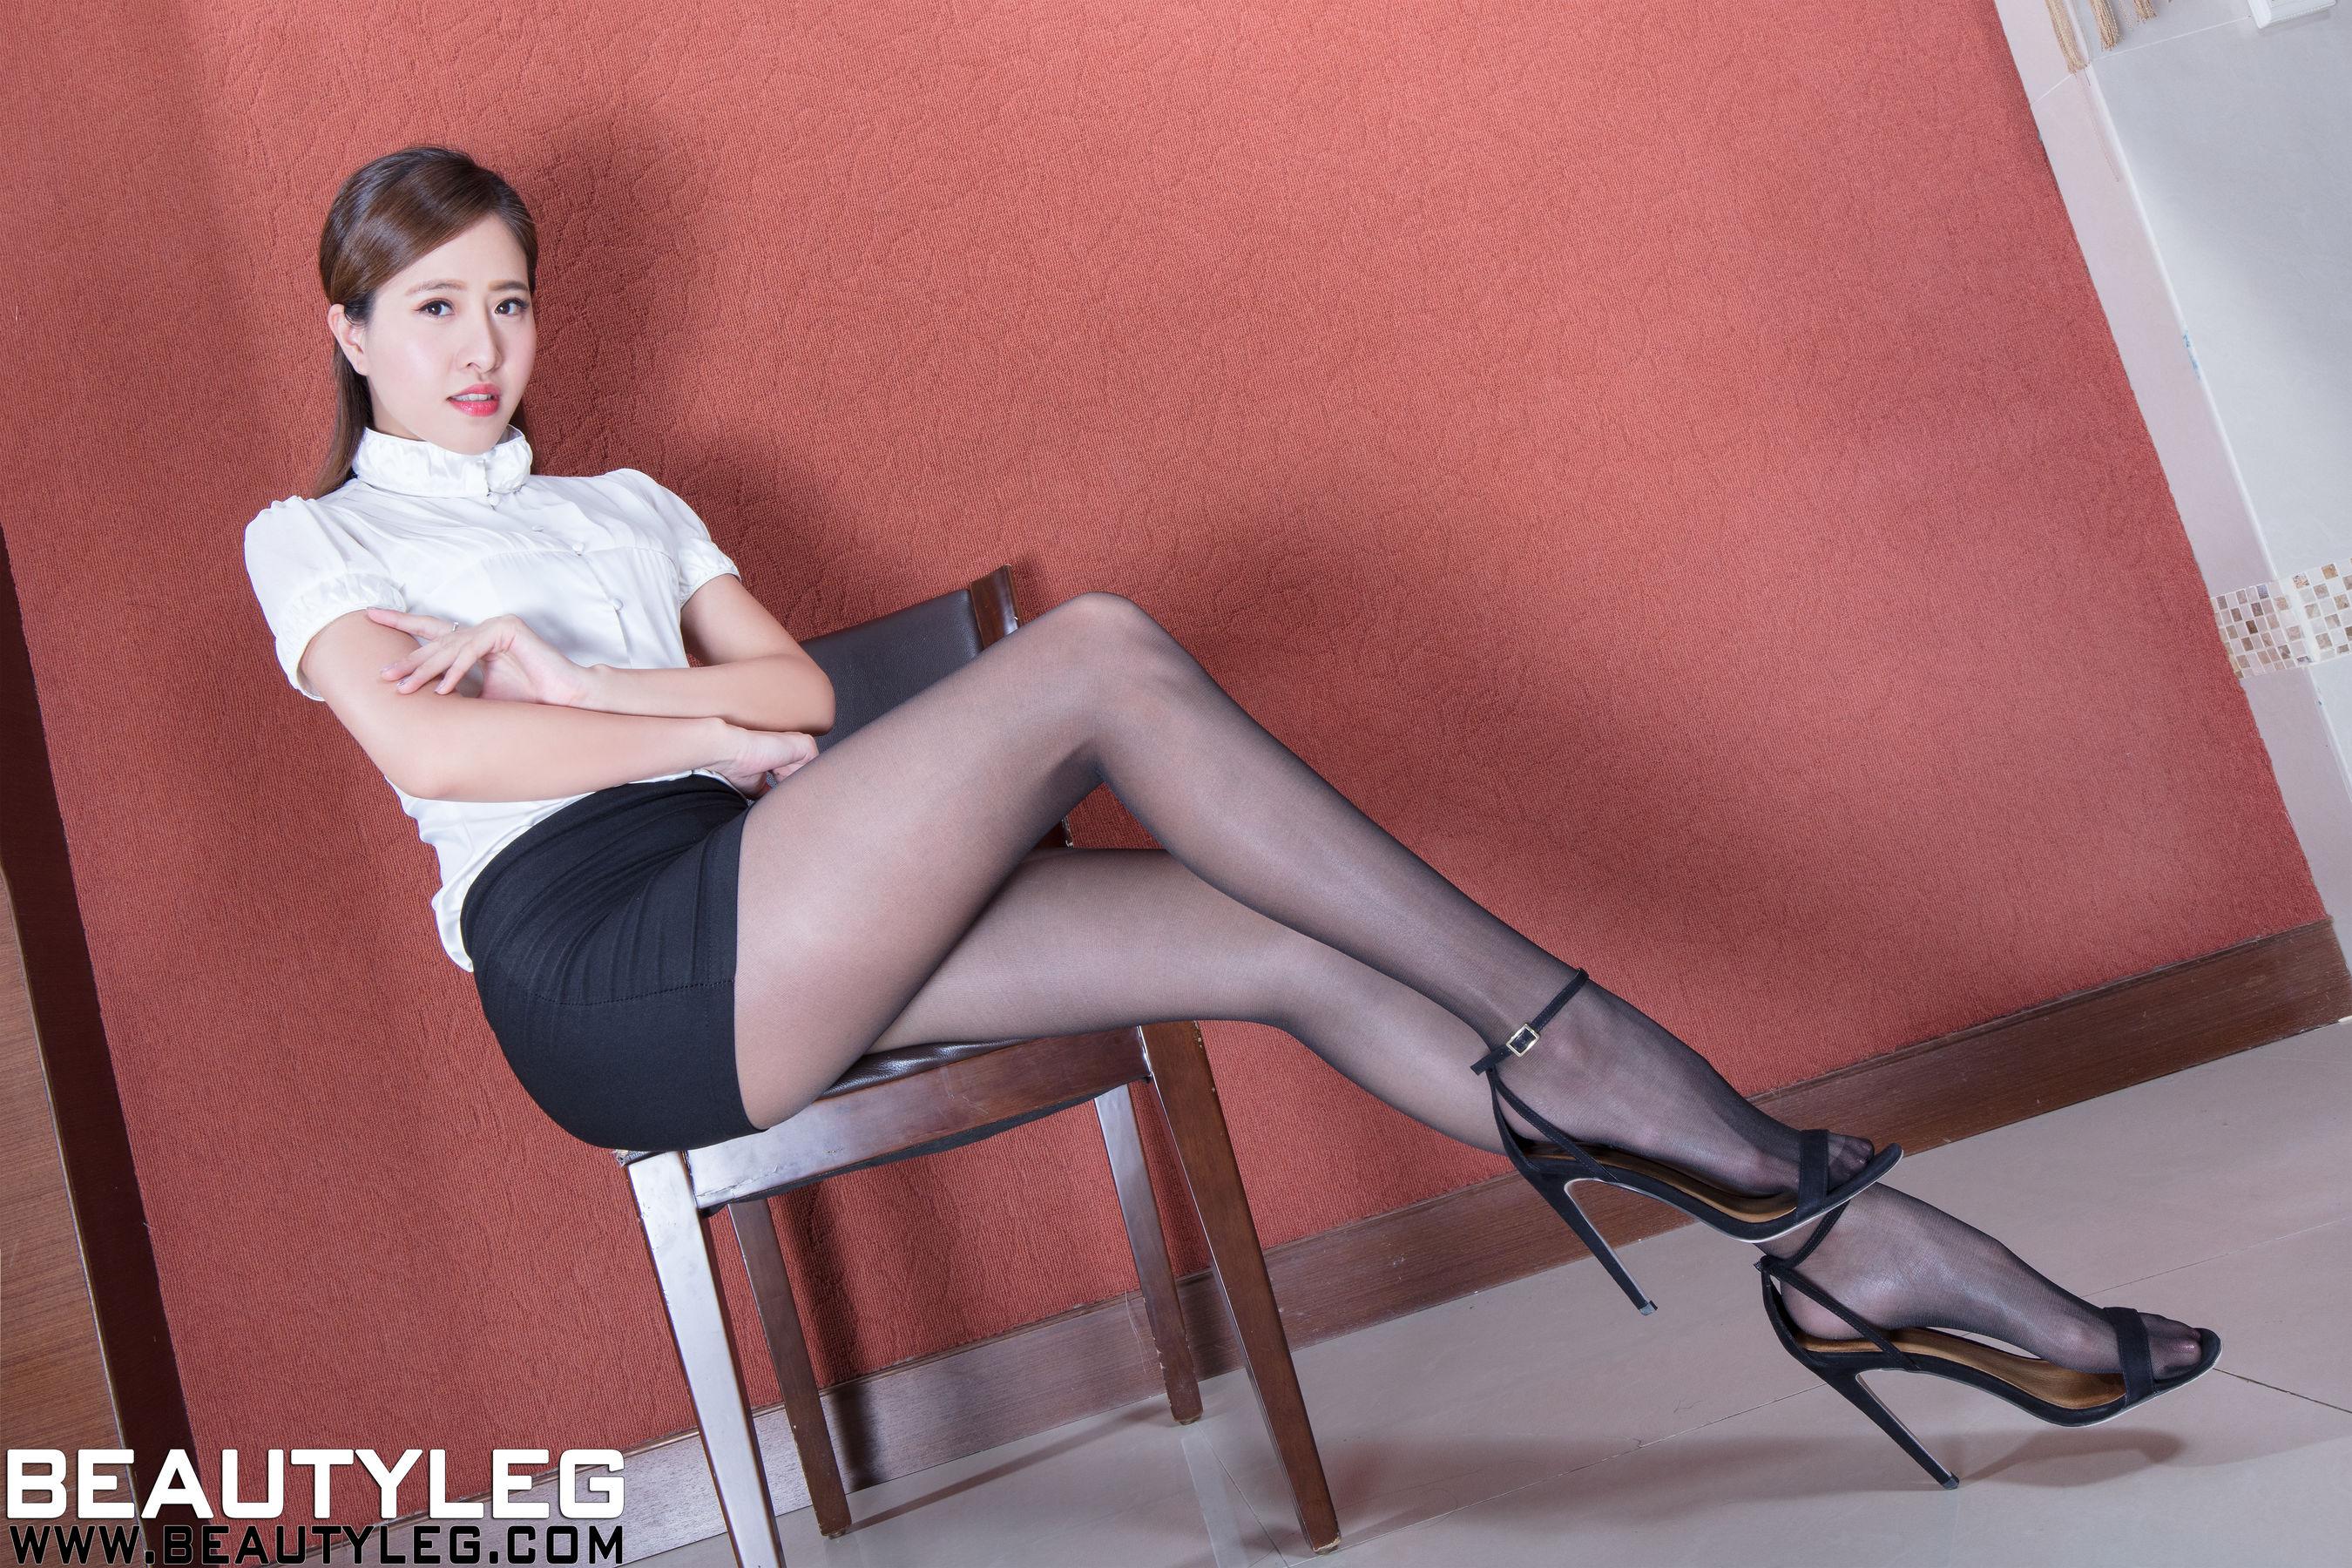 VOL.1449 [Beautyleg]丝袜美腿黑丝美腿:张欣慈(腿模Olivia)超高清个人性感漂亮大图(53P)